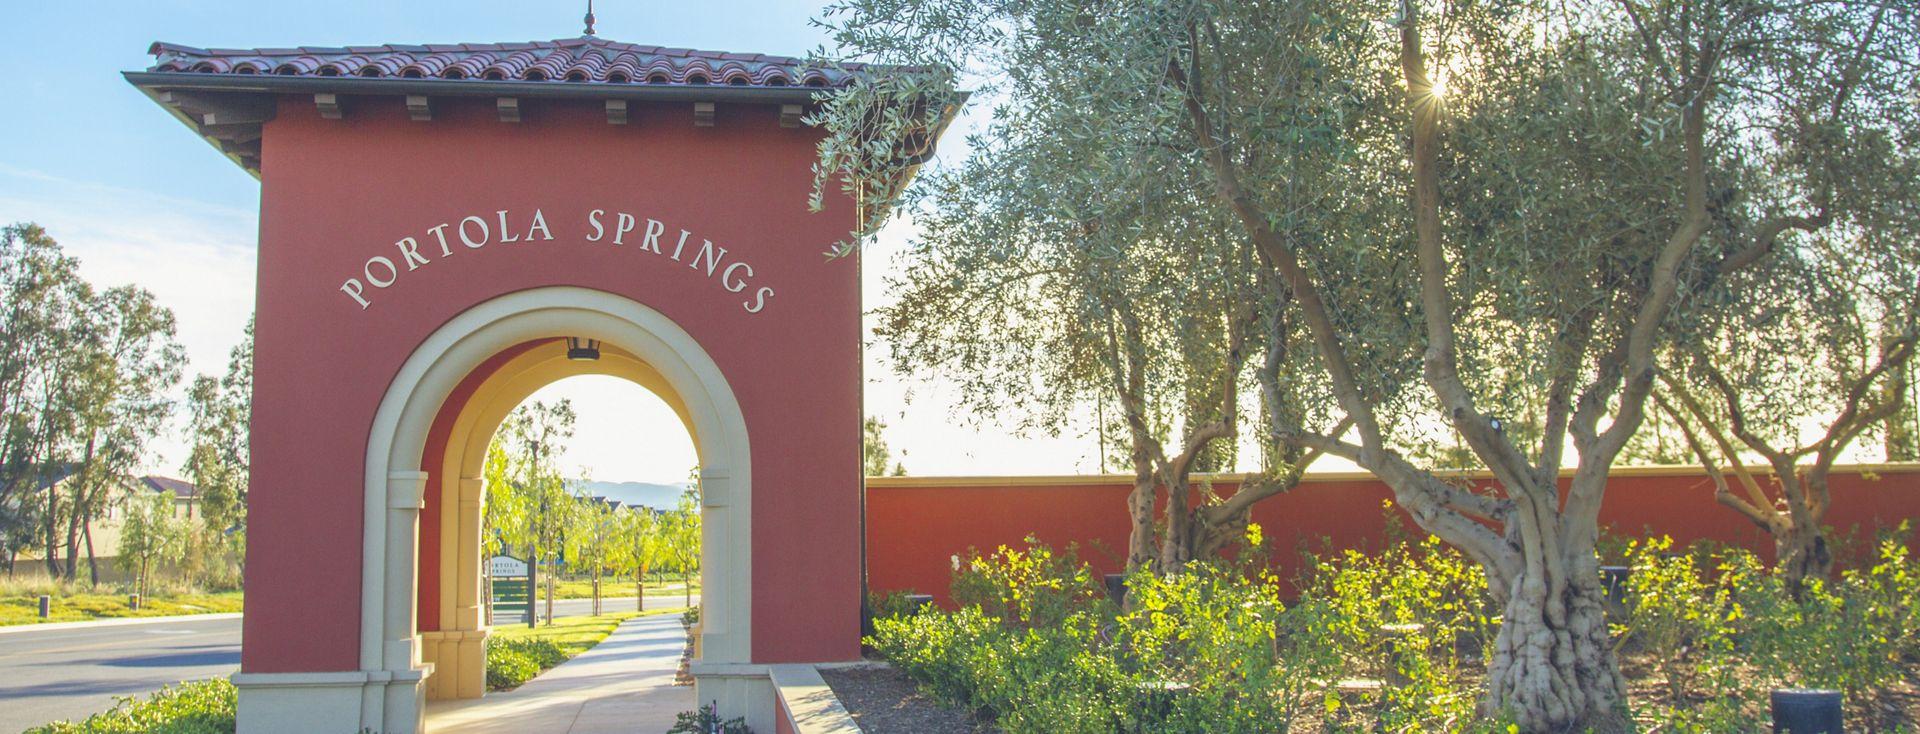 General views of parks in Portola Springs community. Vu 2015.